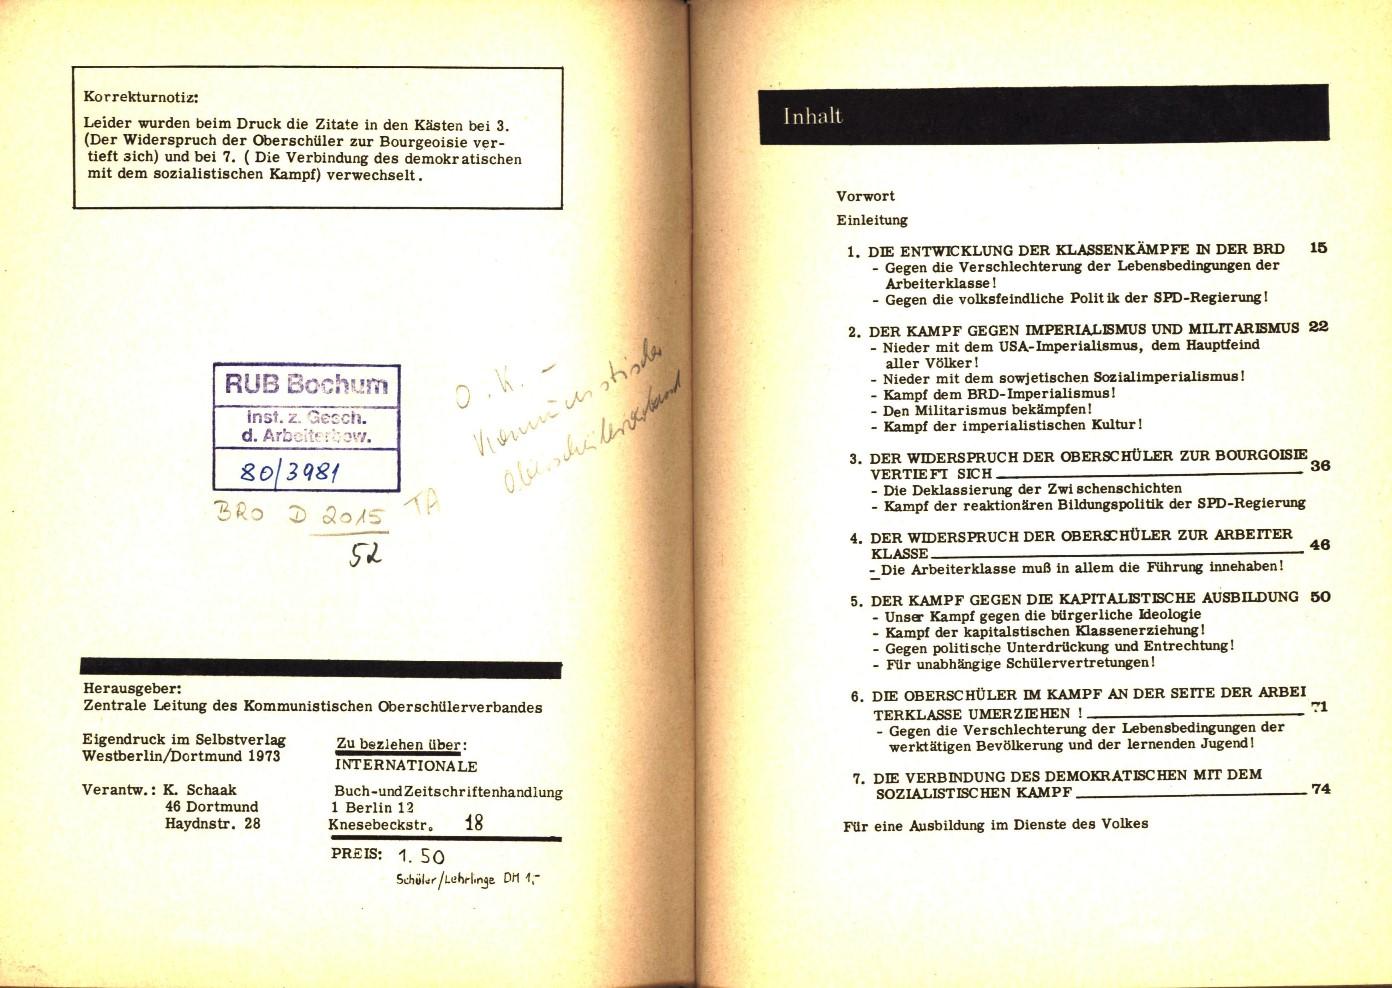 KOV_1973_Aktionsprogramm_04